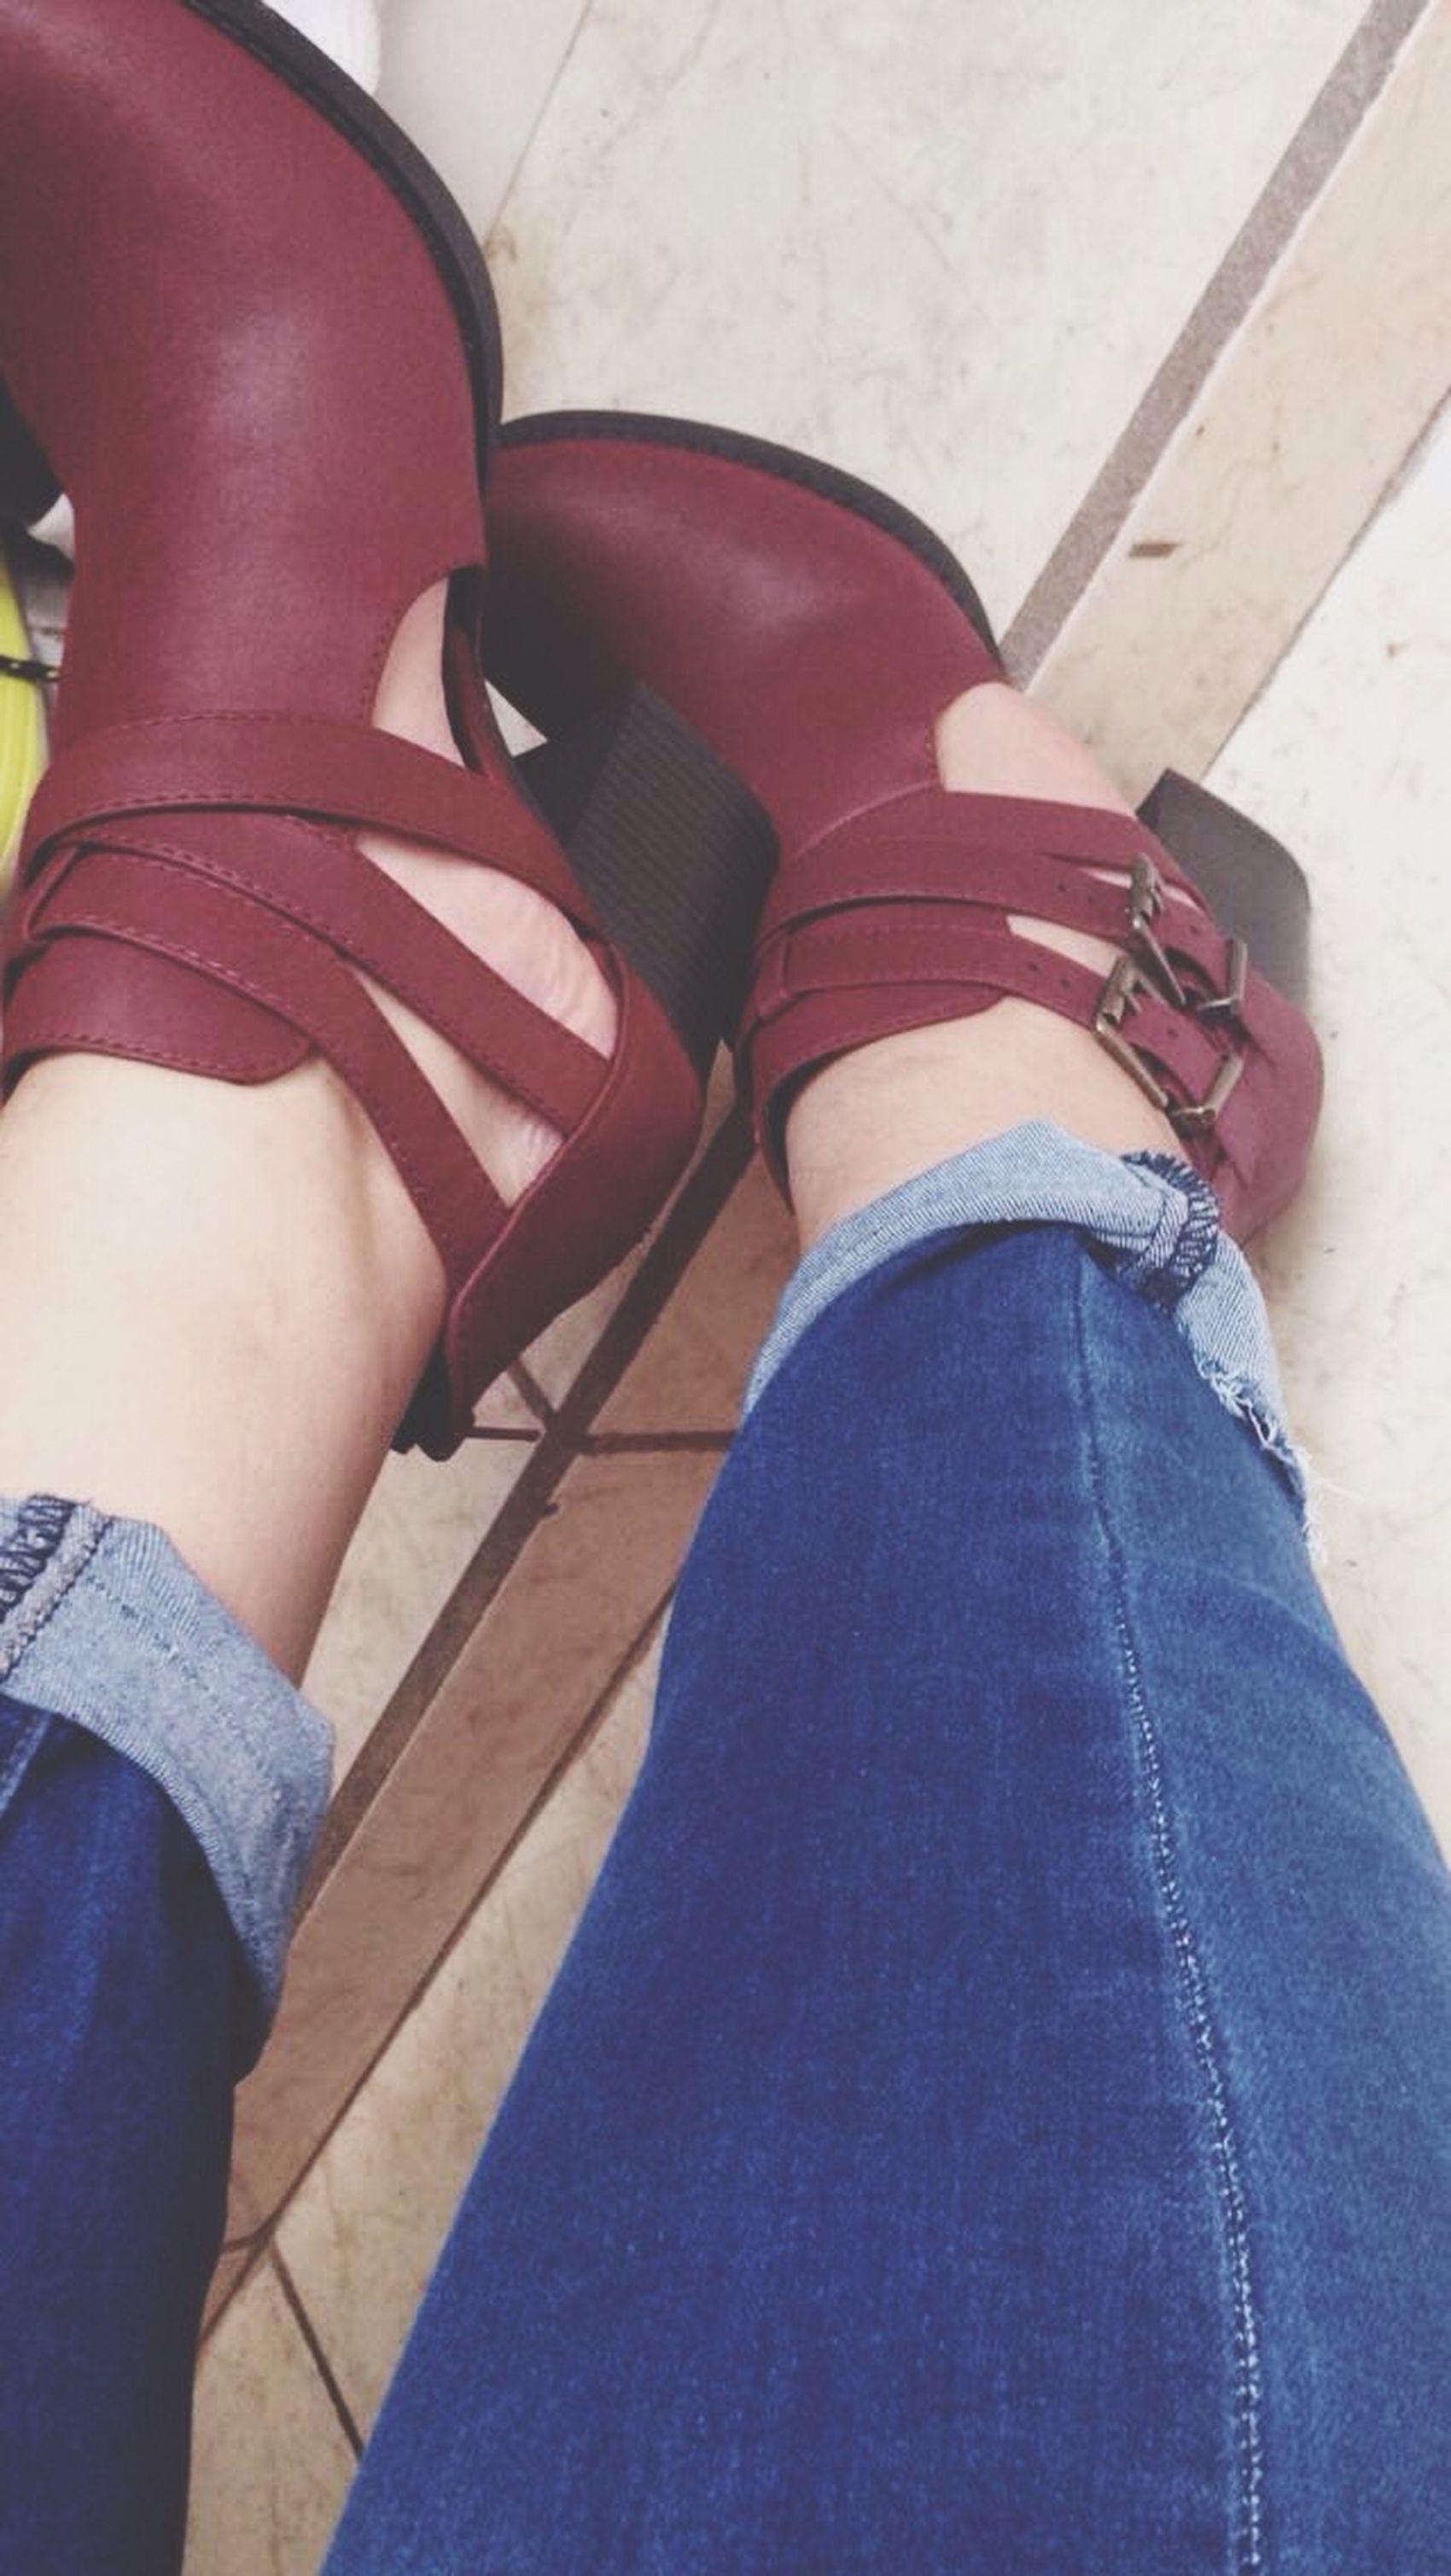 Yuju! 💃🏻 Zapatos Botitas Shoe Loveshoes Party Lifestyles